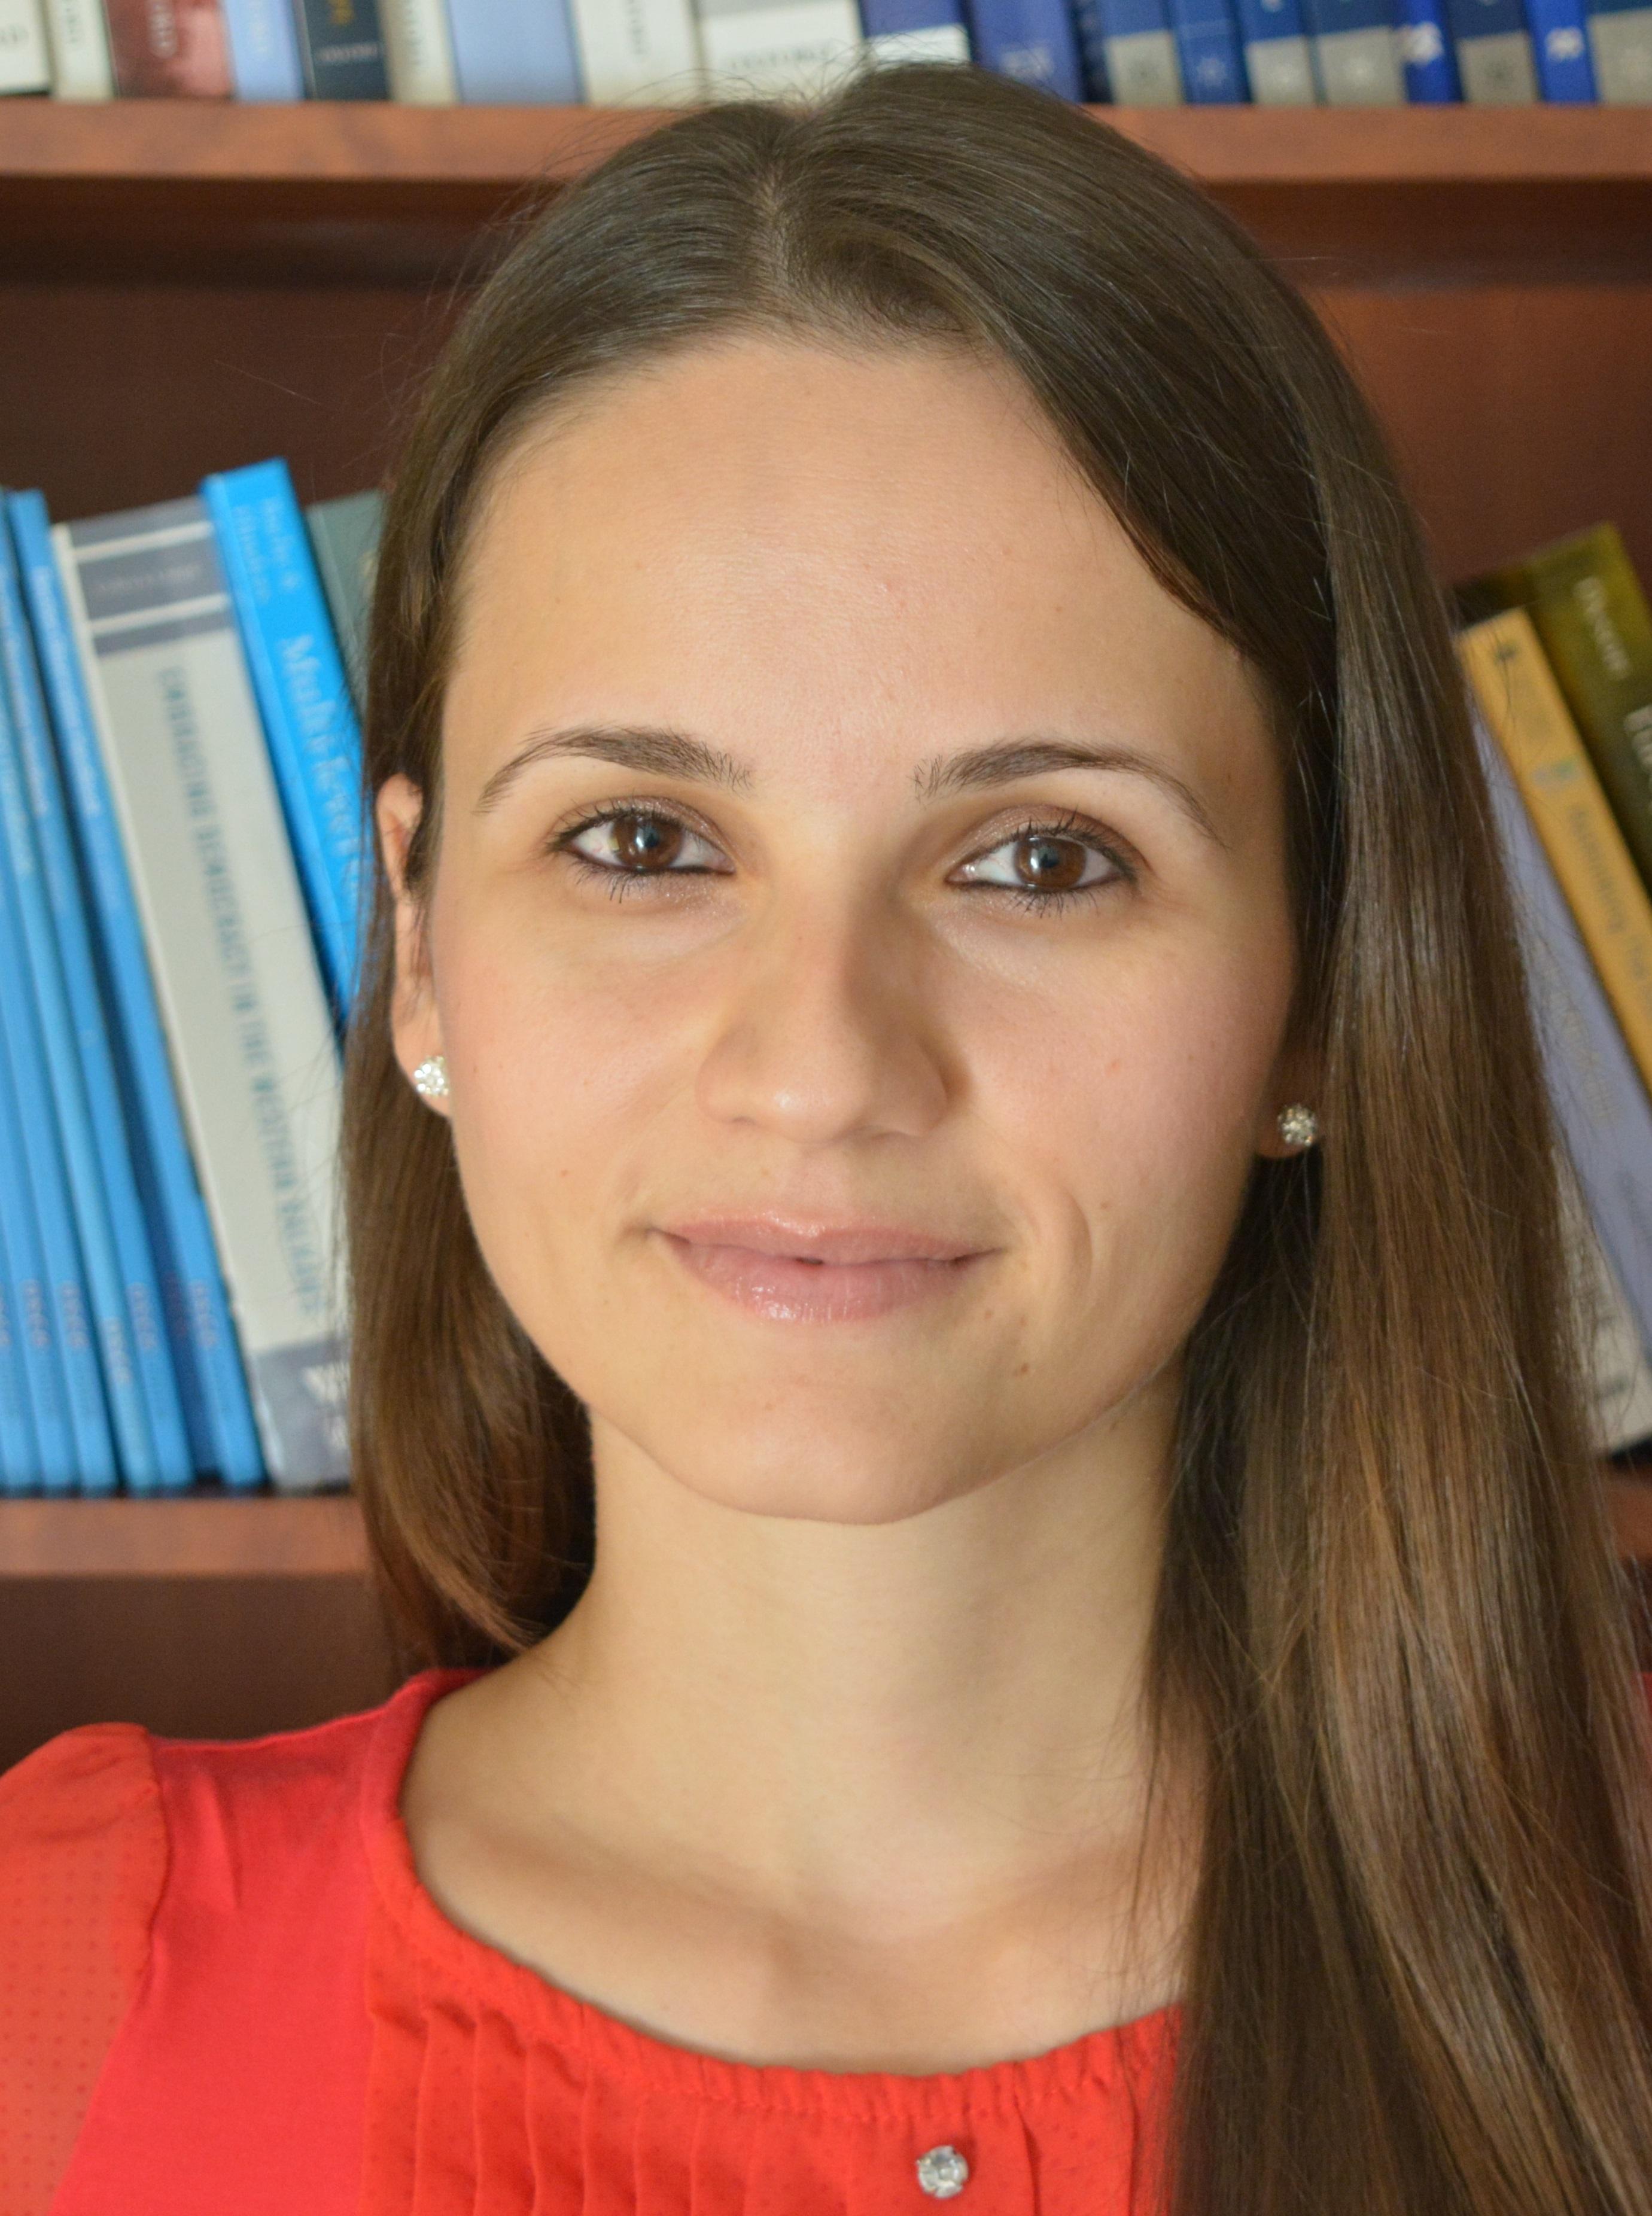 https://webadmin.uni-graz.at/fileadmin/Studien/political-economic-legal-philosophy/Studierende/Hristina_Schnitt.jpg